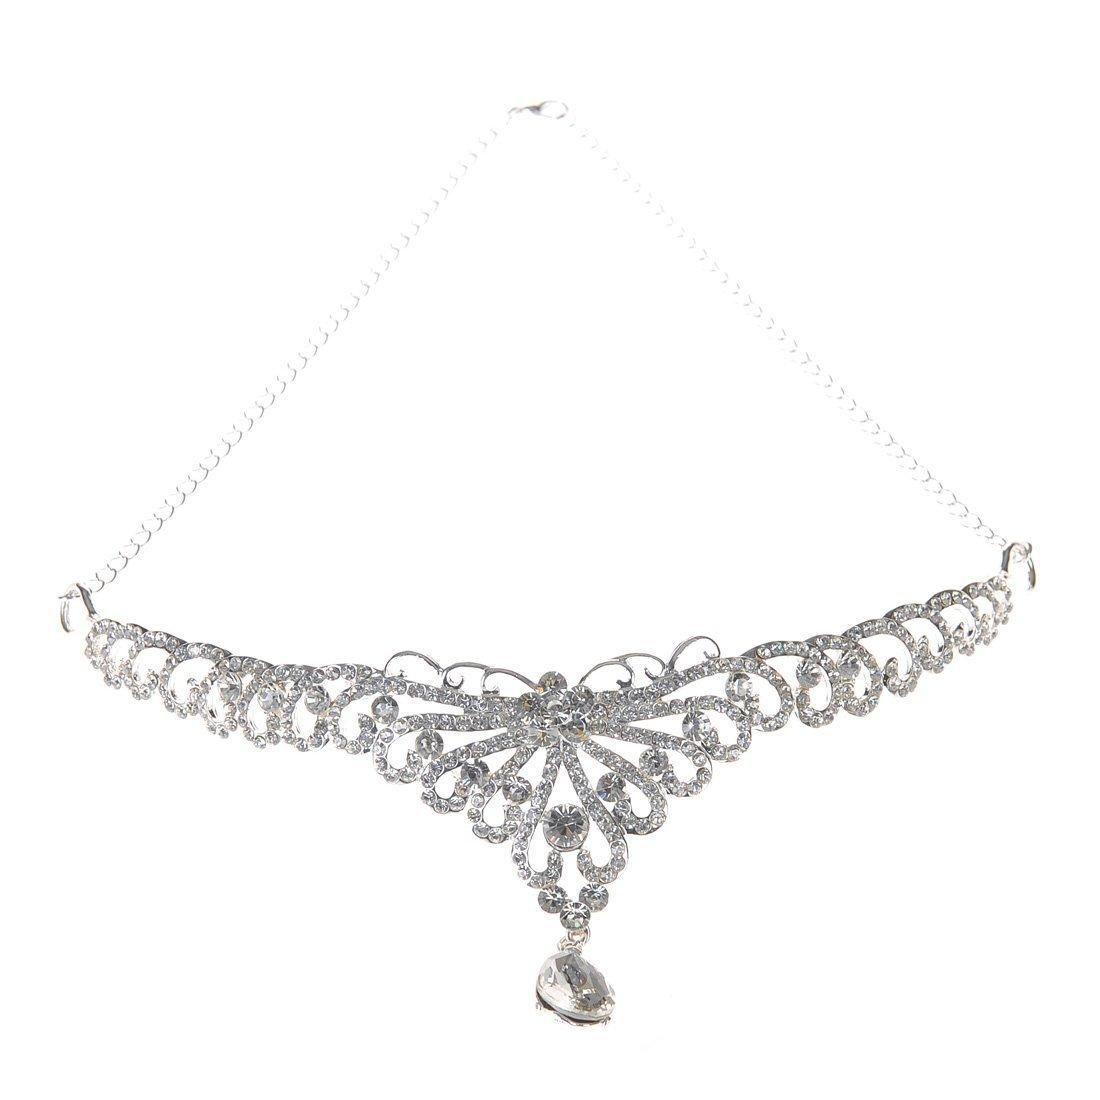 Topwedding Crystal Rhinestone Wedding Bridal Tiara Crown Headpiece forehead Chain